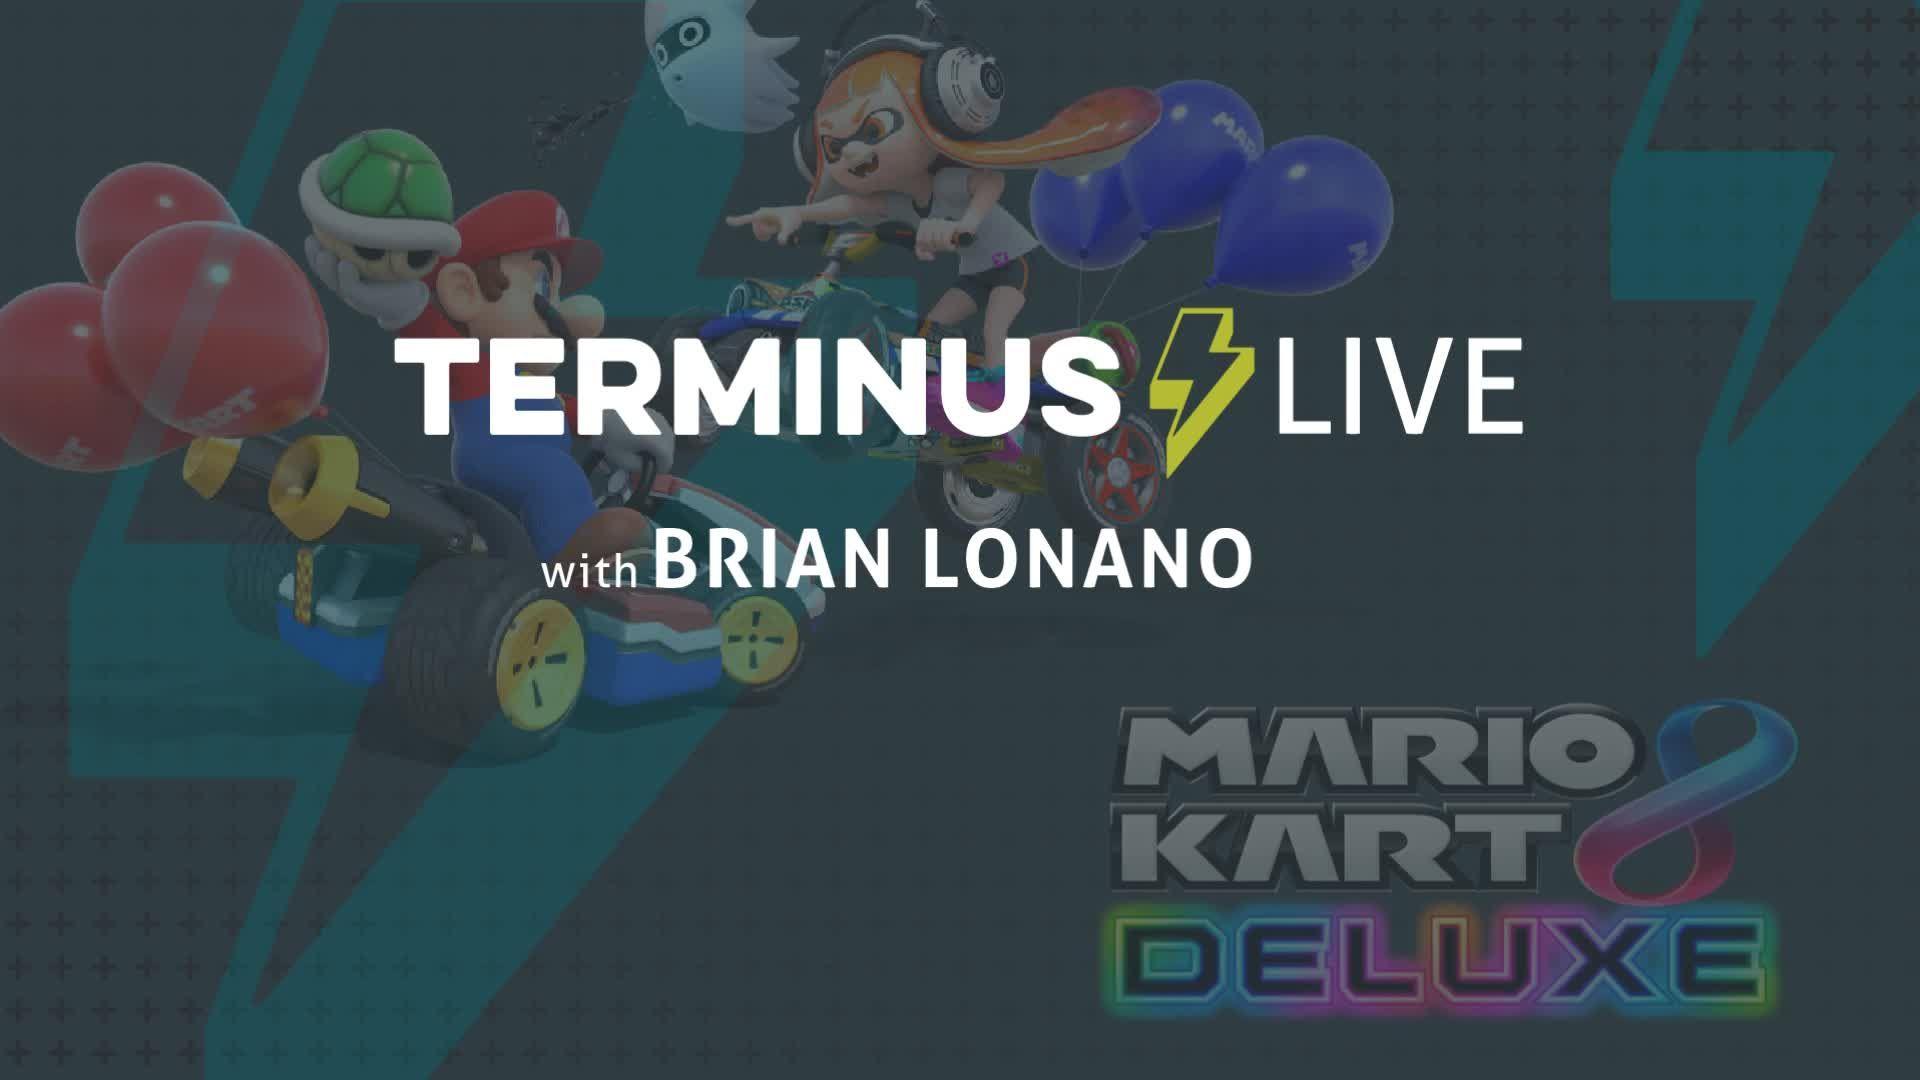 TERMINUS Live: Brian Lonano plays Mario Kart 8